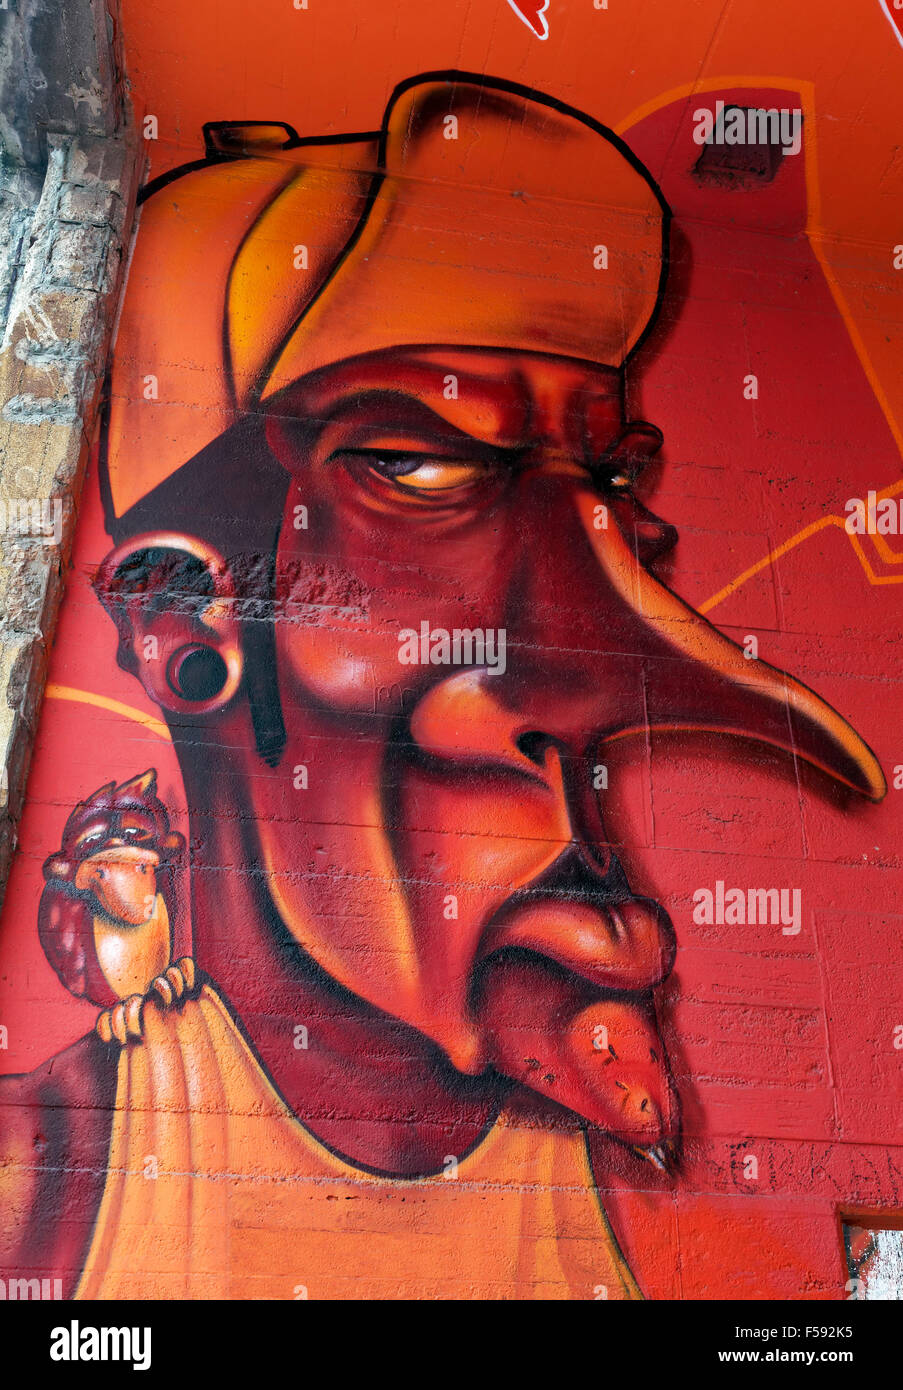 Grimace, evil eye, long nose, graffiti, street art, Duisburg, North Rhine-Westphalia, Germany - Stock Image